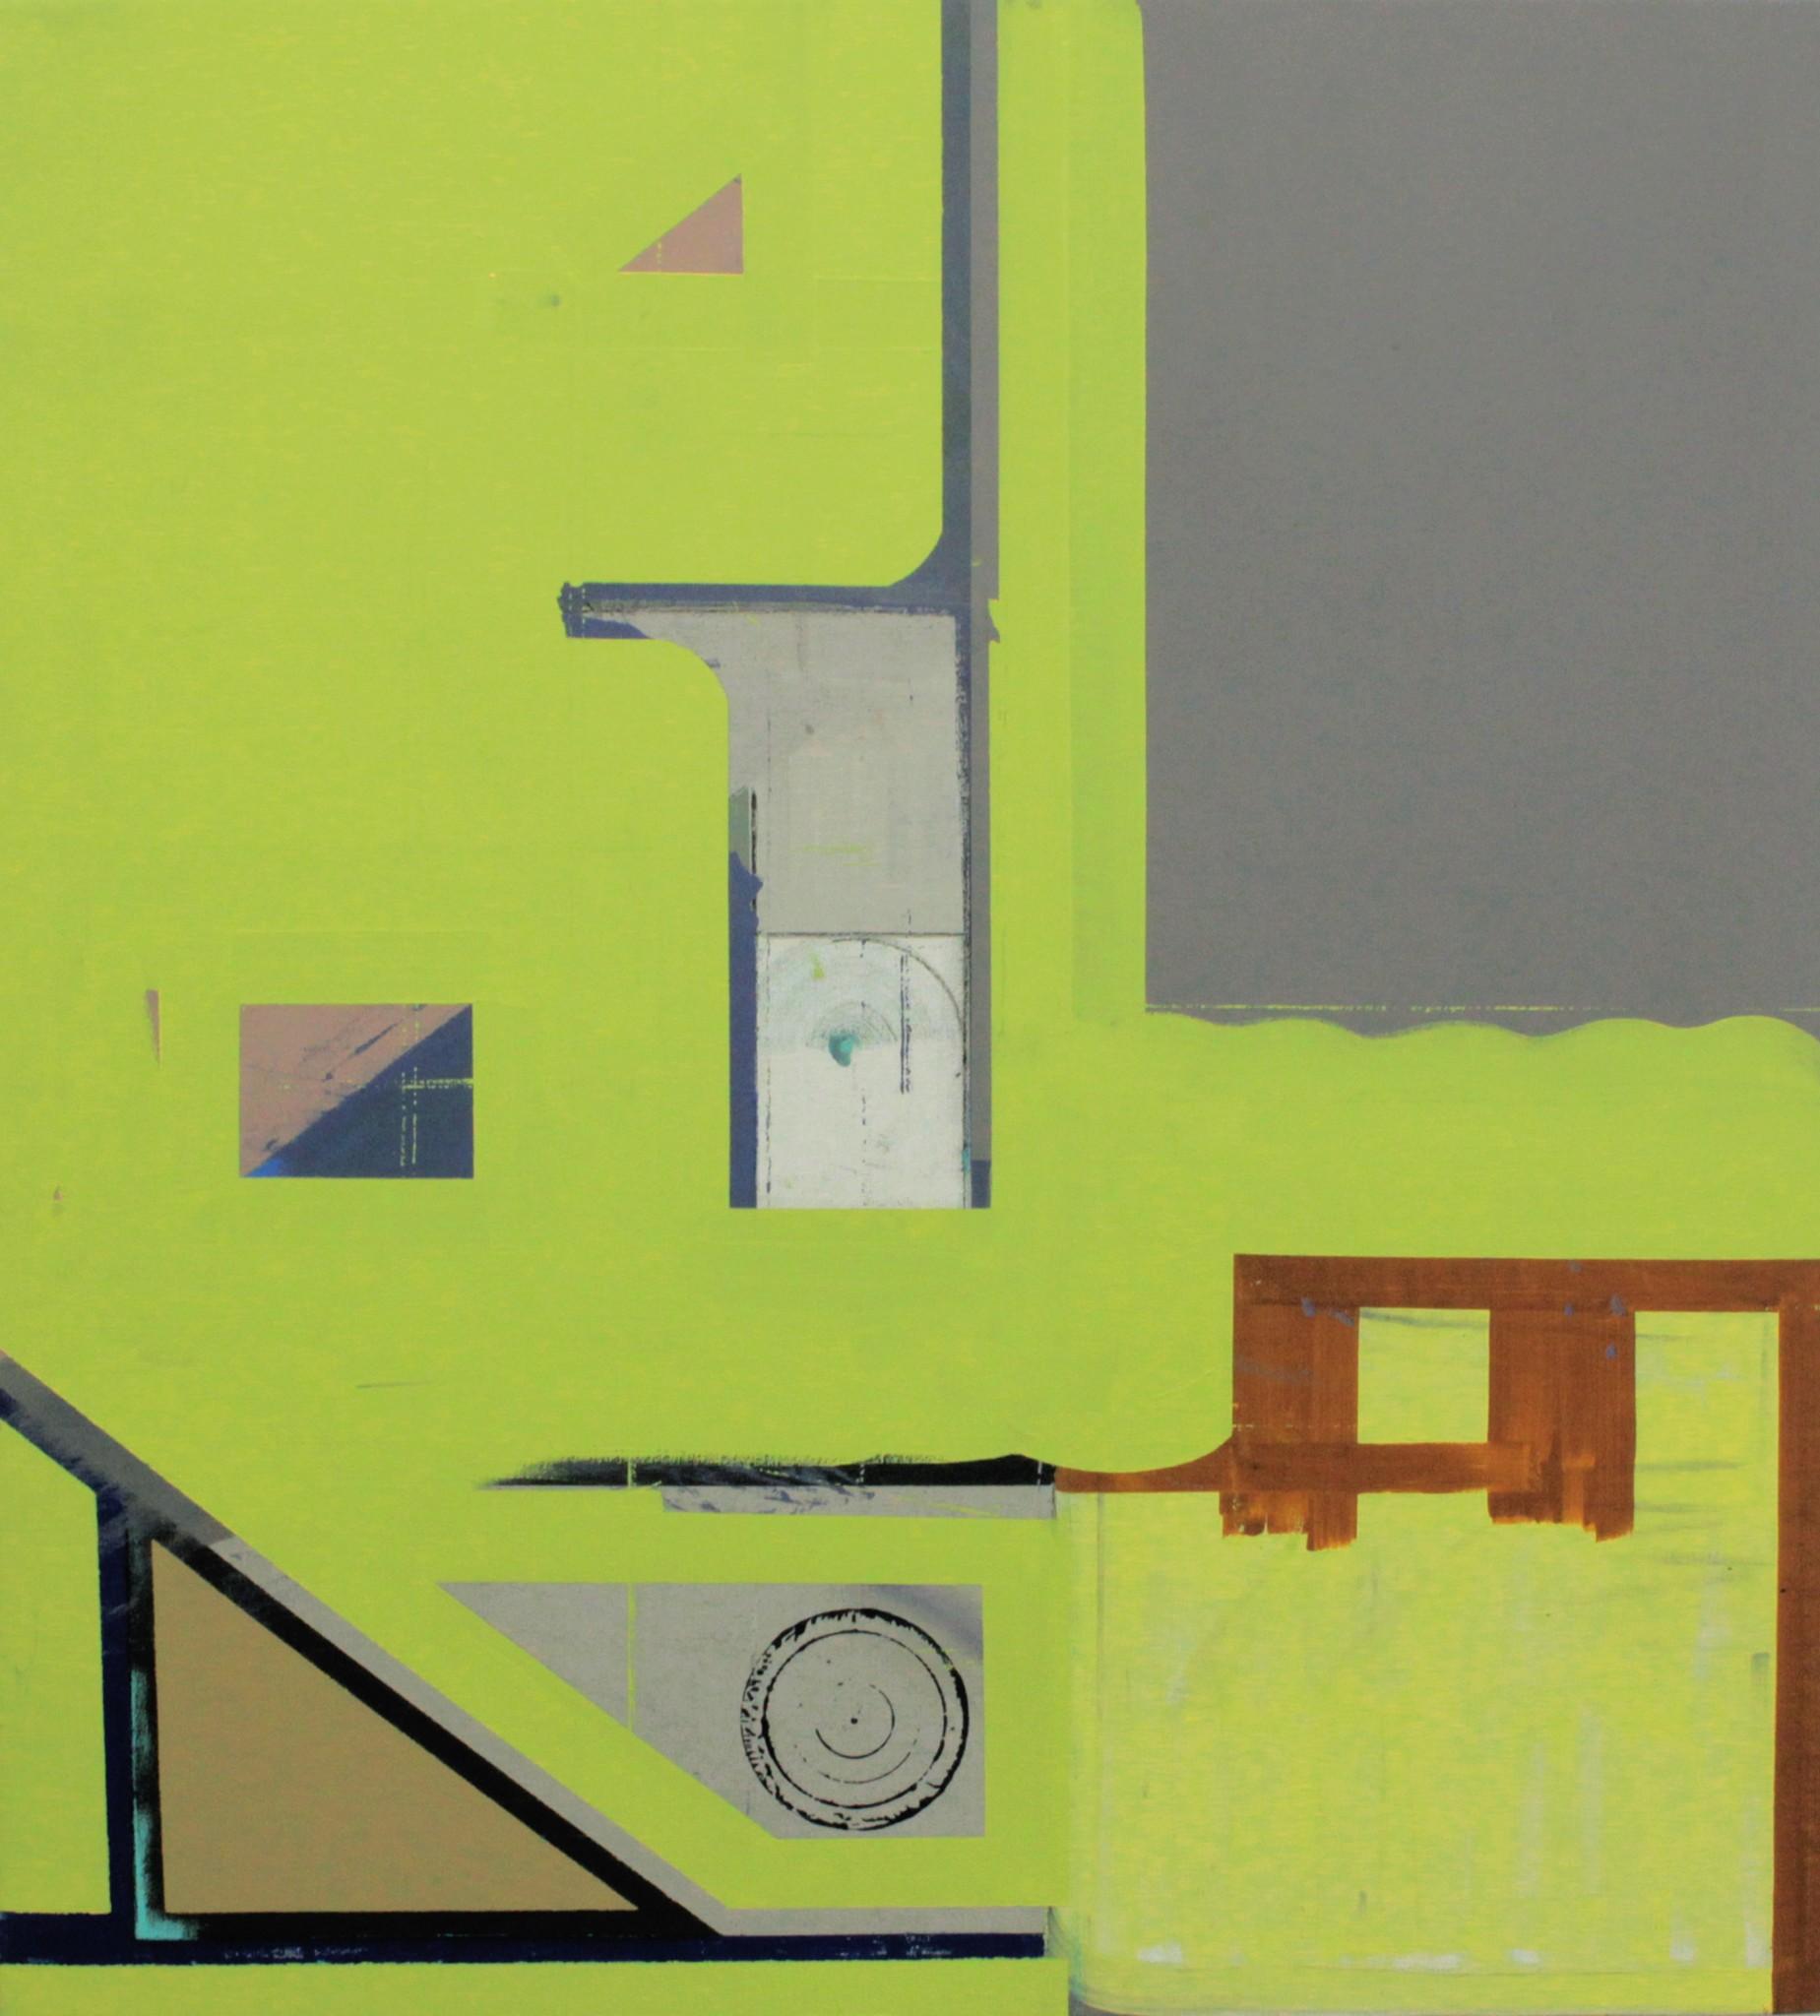 Utan titel olja på duk, 90 x 82 cm, 2019